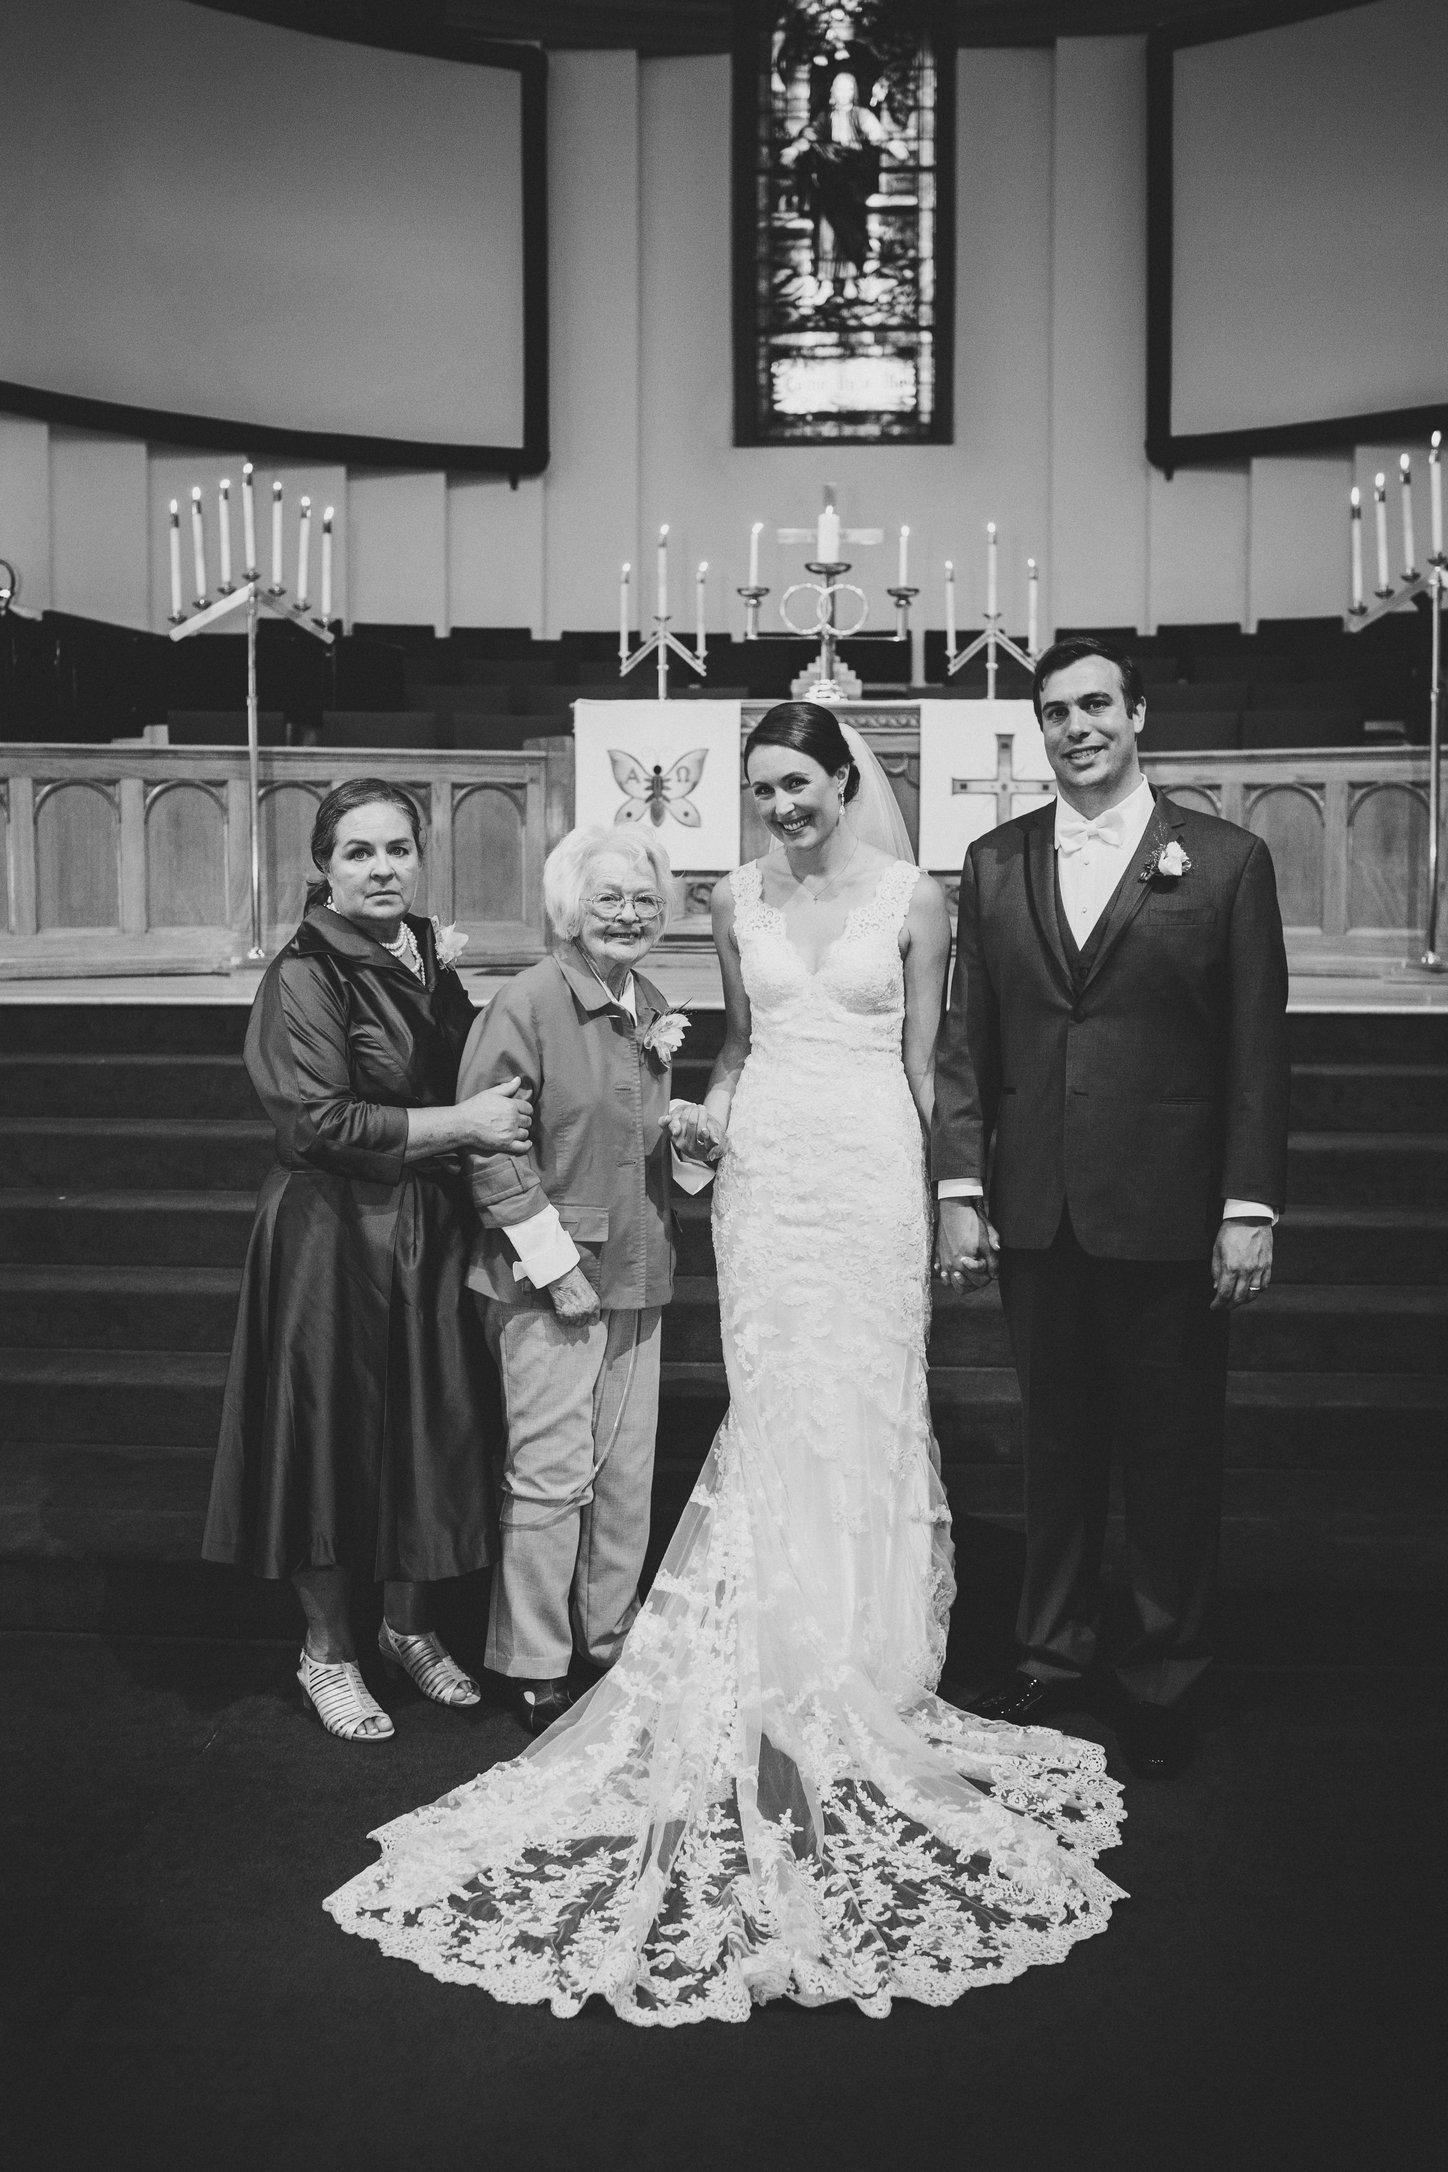 SandC-wedding-275.jpg